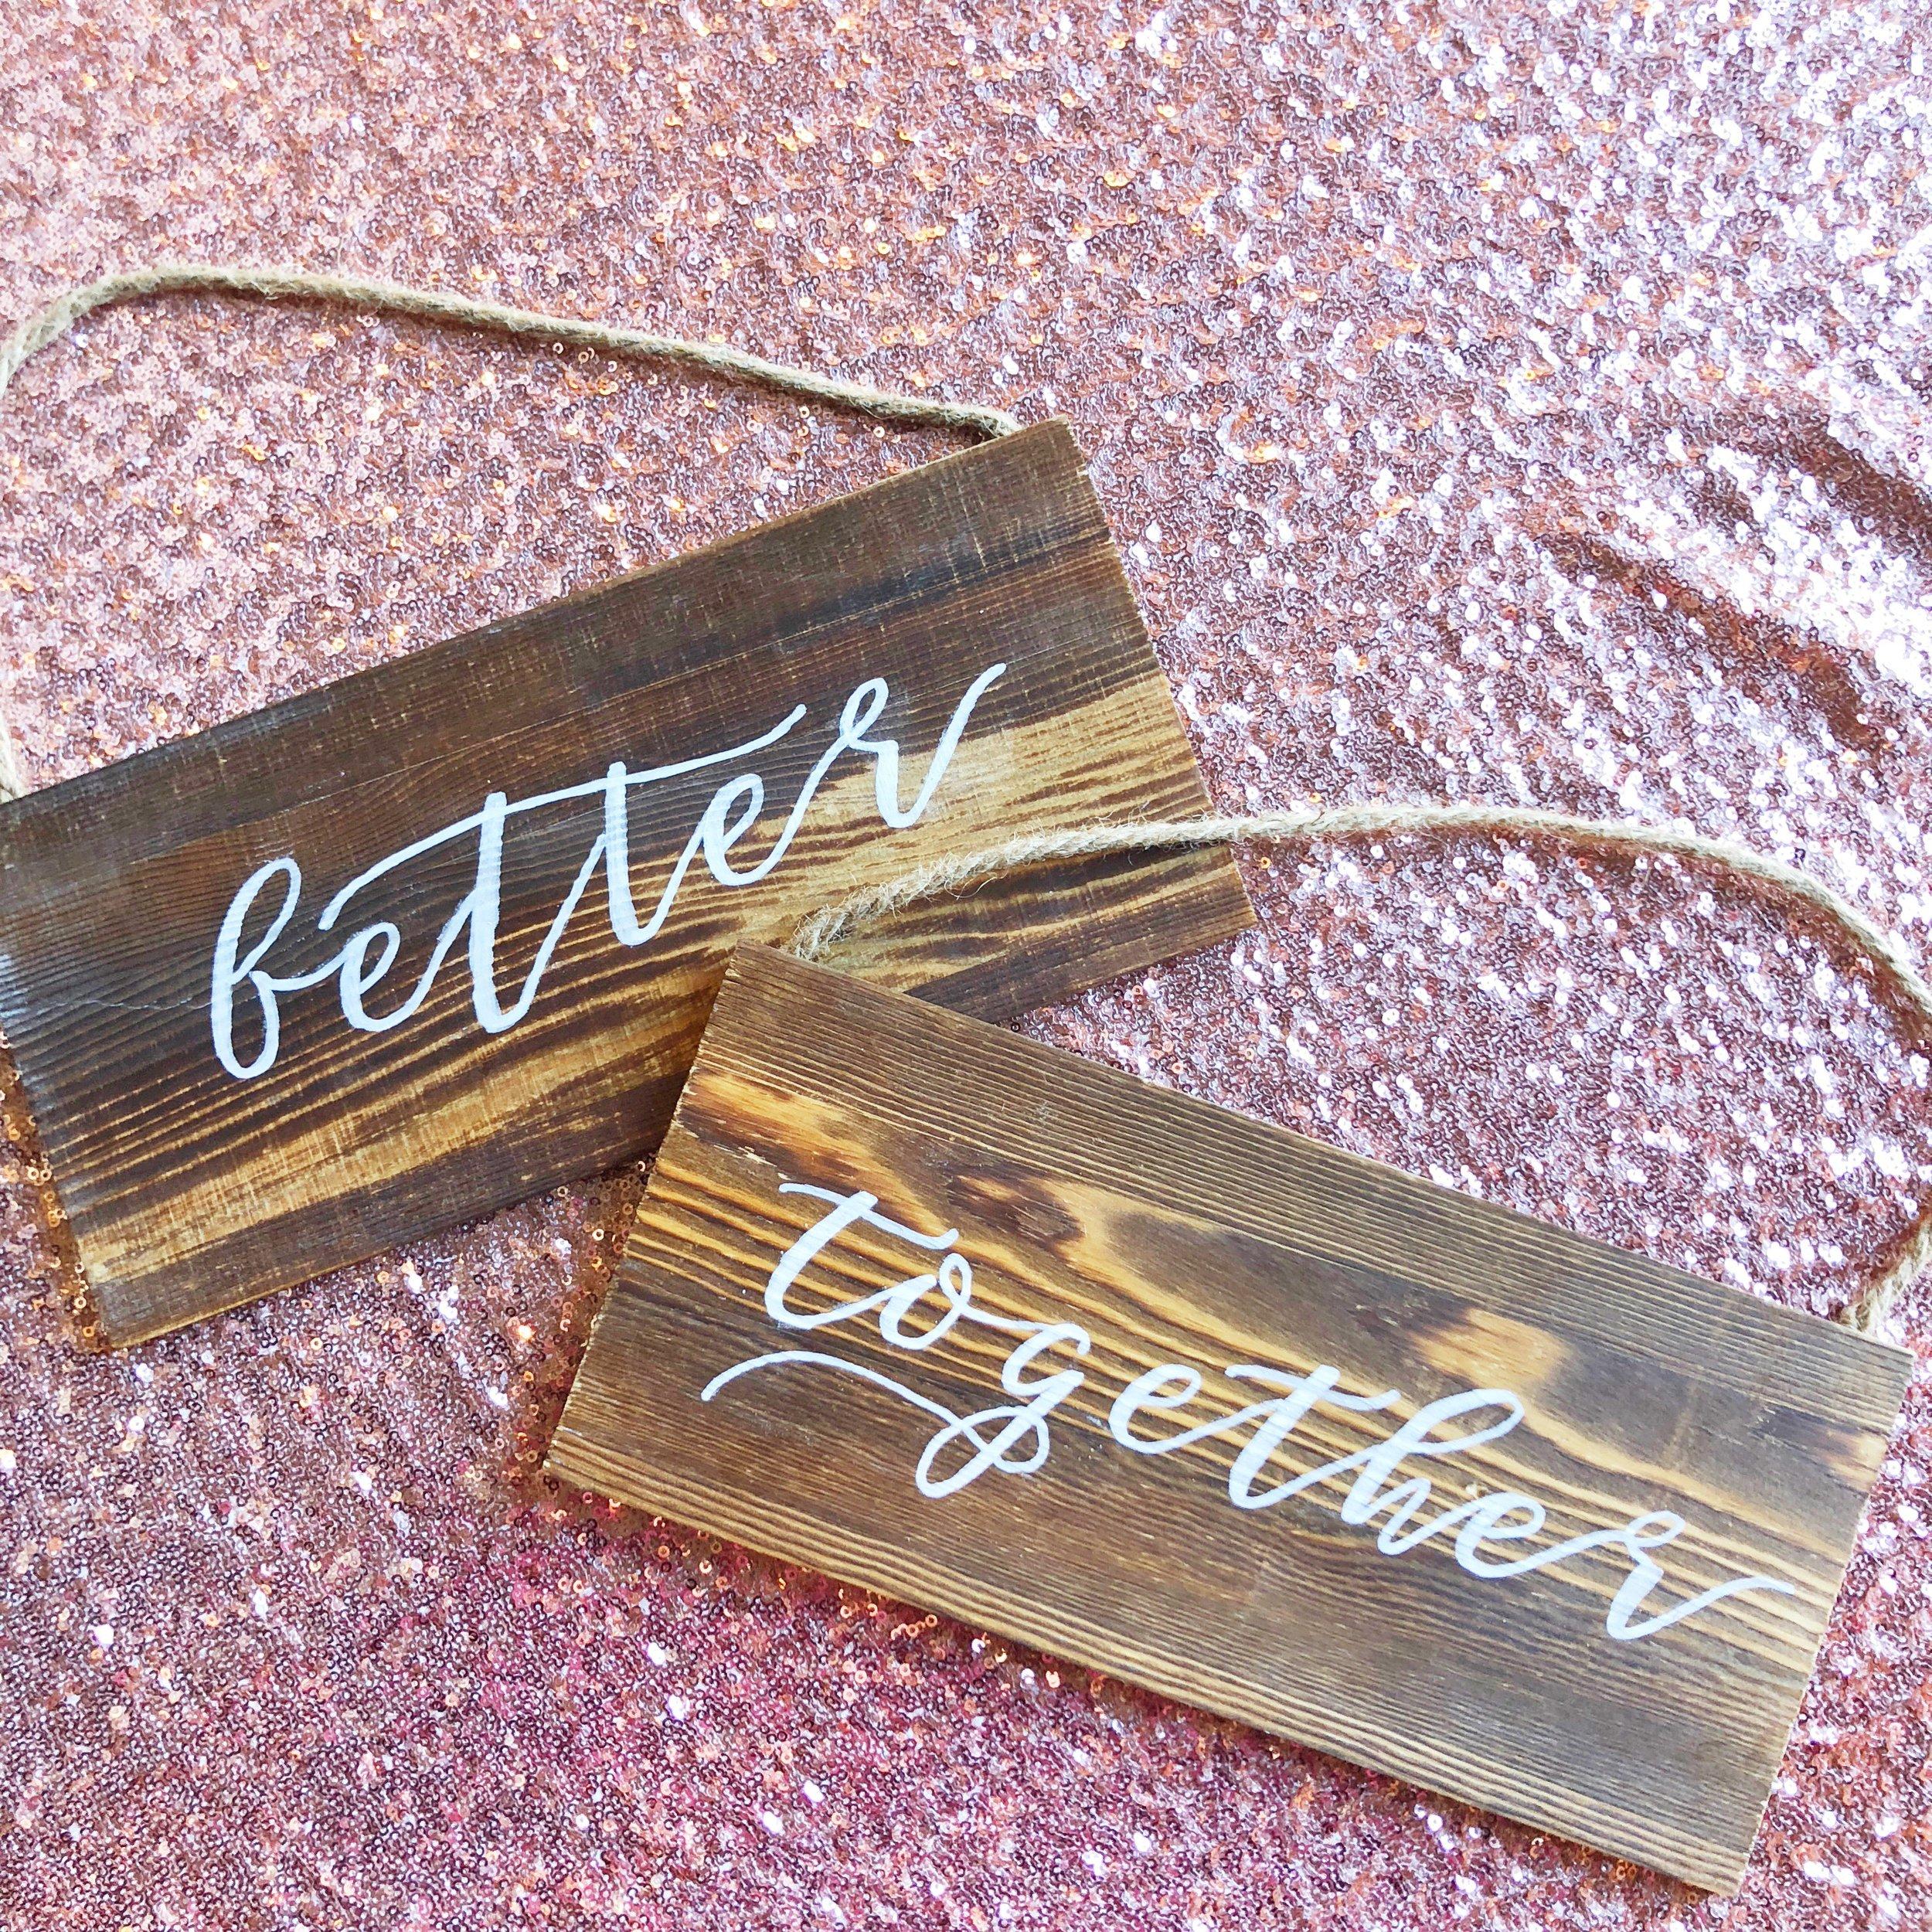 Central PA, York PA, JesSmith Designs, custom, wedding, invitations, bridal, Harrisburg, hanover, calligraphy, baltimore, wedding invitations, lancaster, gettysburg, 03-11 18.25.48.jpg